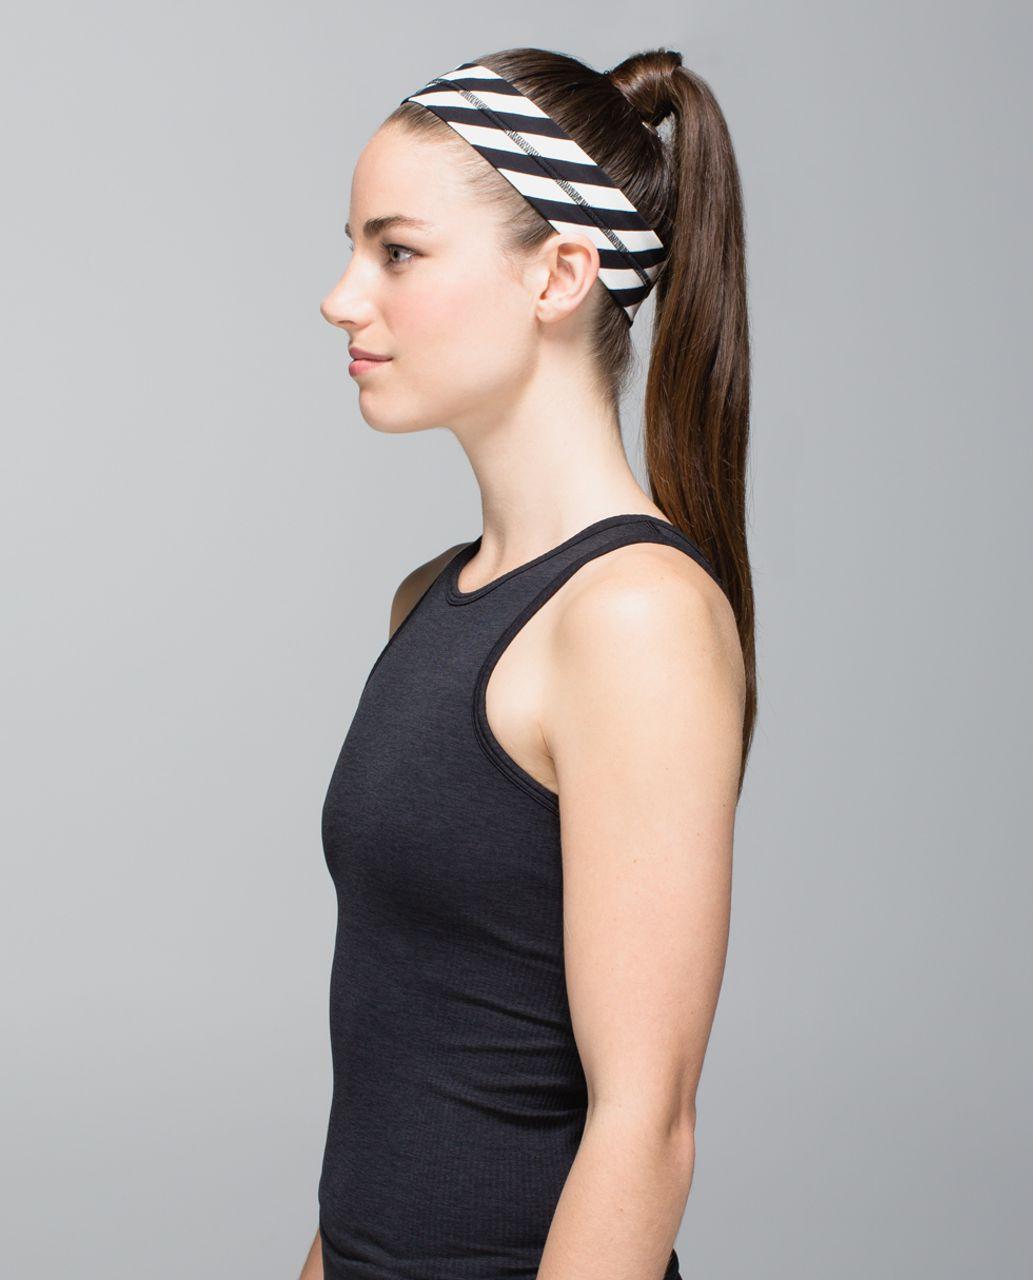 Lululemon Fly Away Tamer Headband - Apex Stripe Black Angel Wing